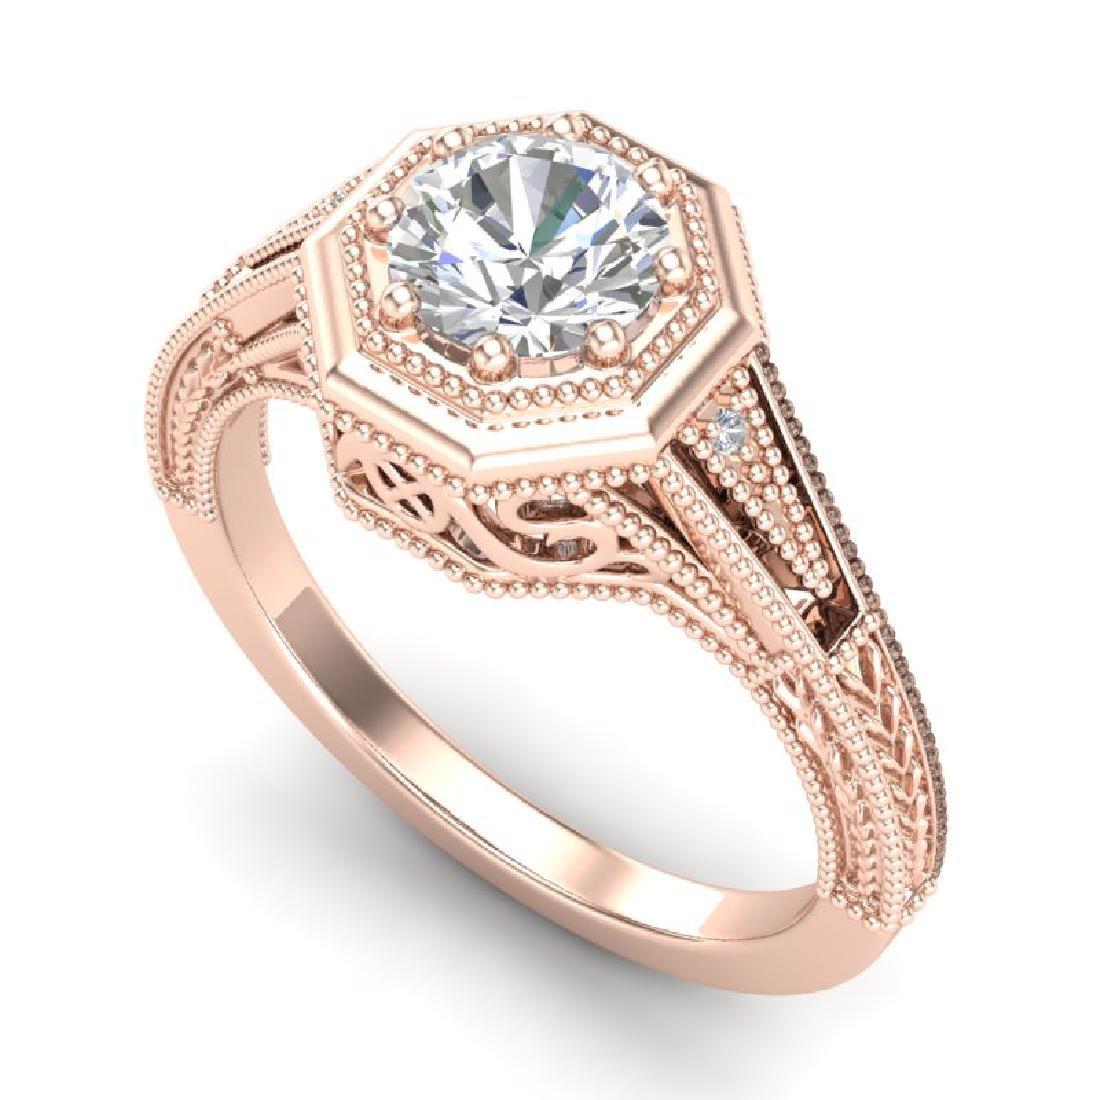 0.84 CTW VS/SI Diamond Solitaire Art Deco Ring 18K Rose